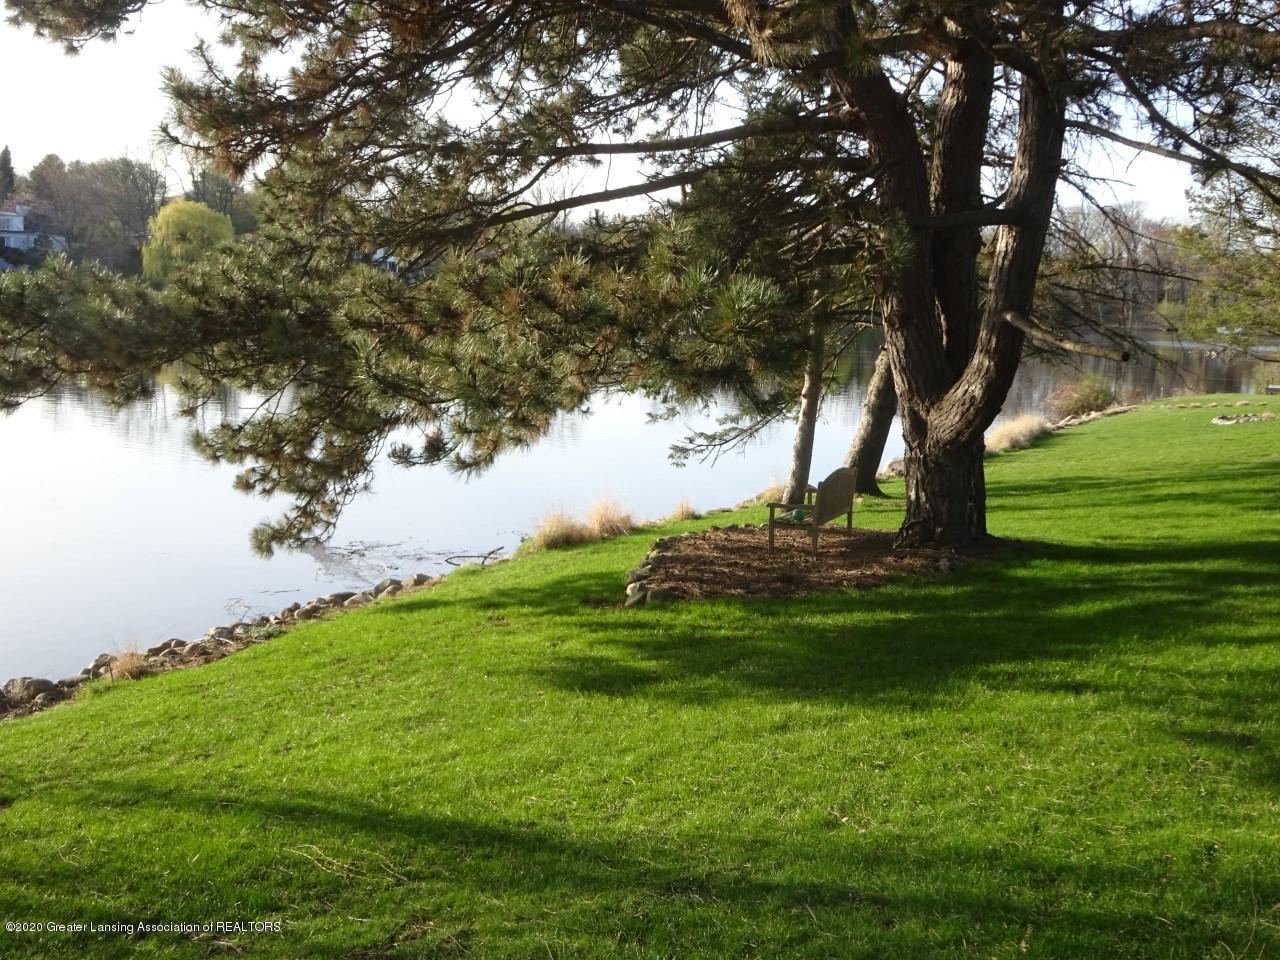 4300 Pine Tree Ln - Summer - 86